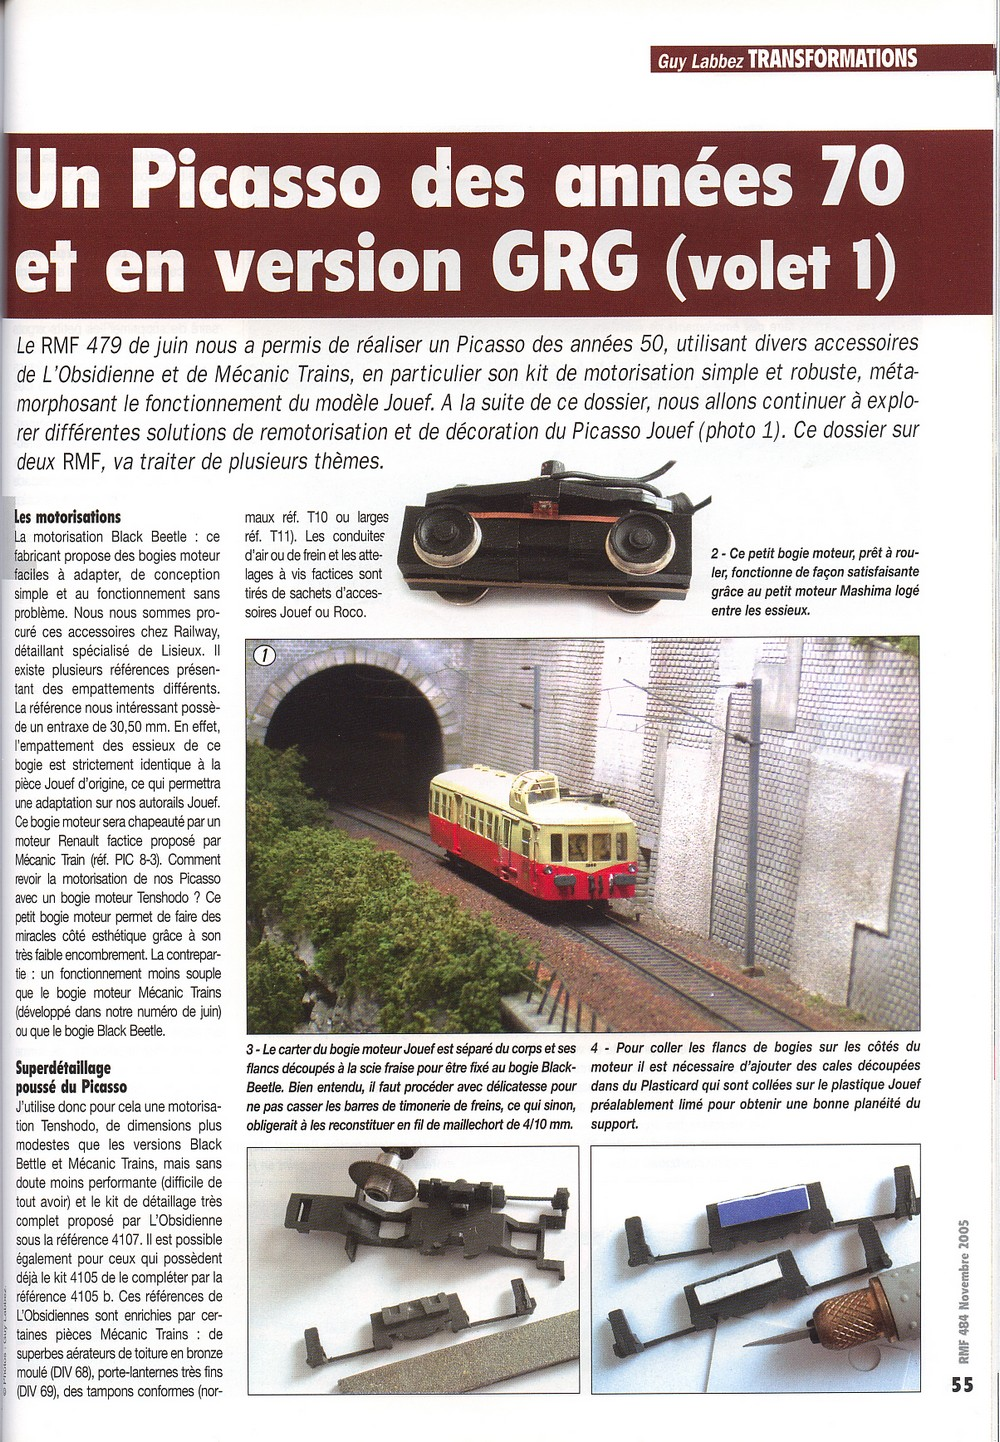 transformation x3800 années 70 GRG Rmf 484 (partie 1) 1201270136151121309352080